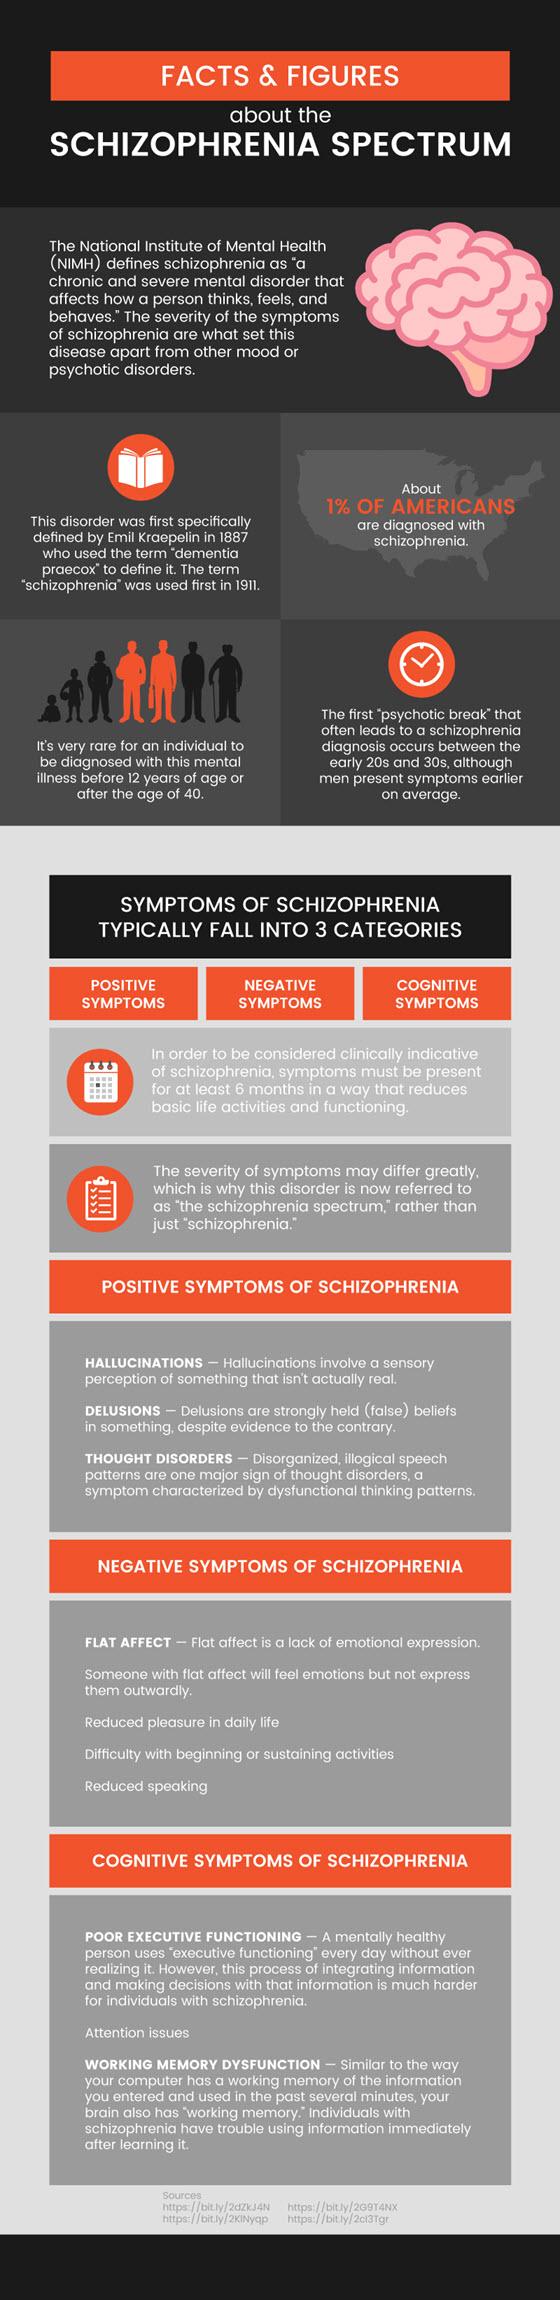 Symptoms of schizophrenia - MKexpress.net